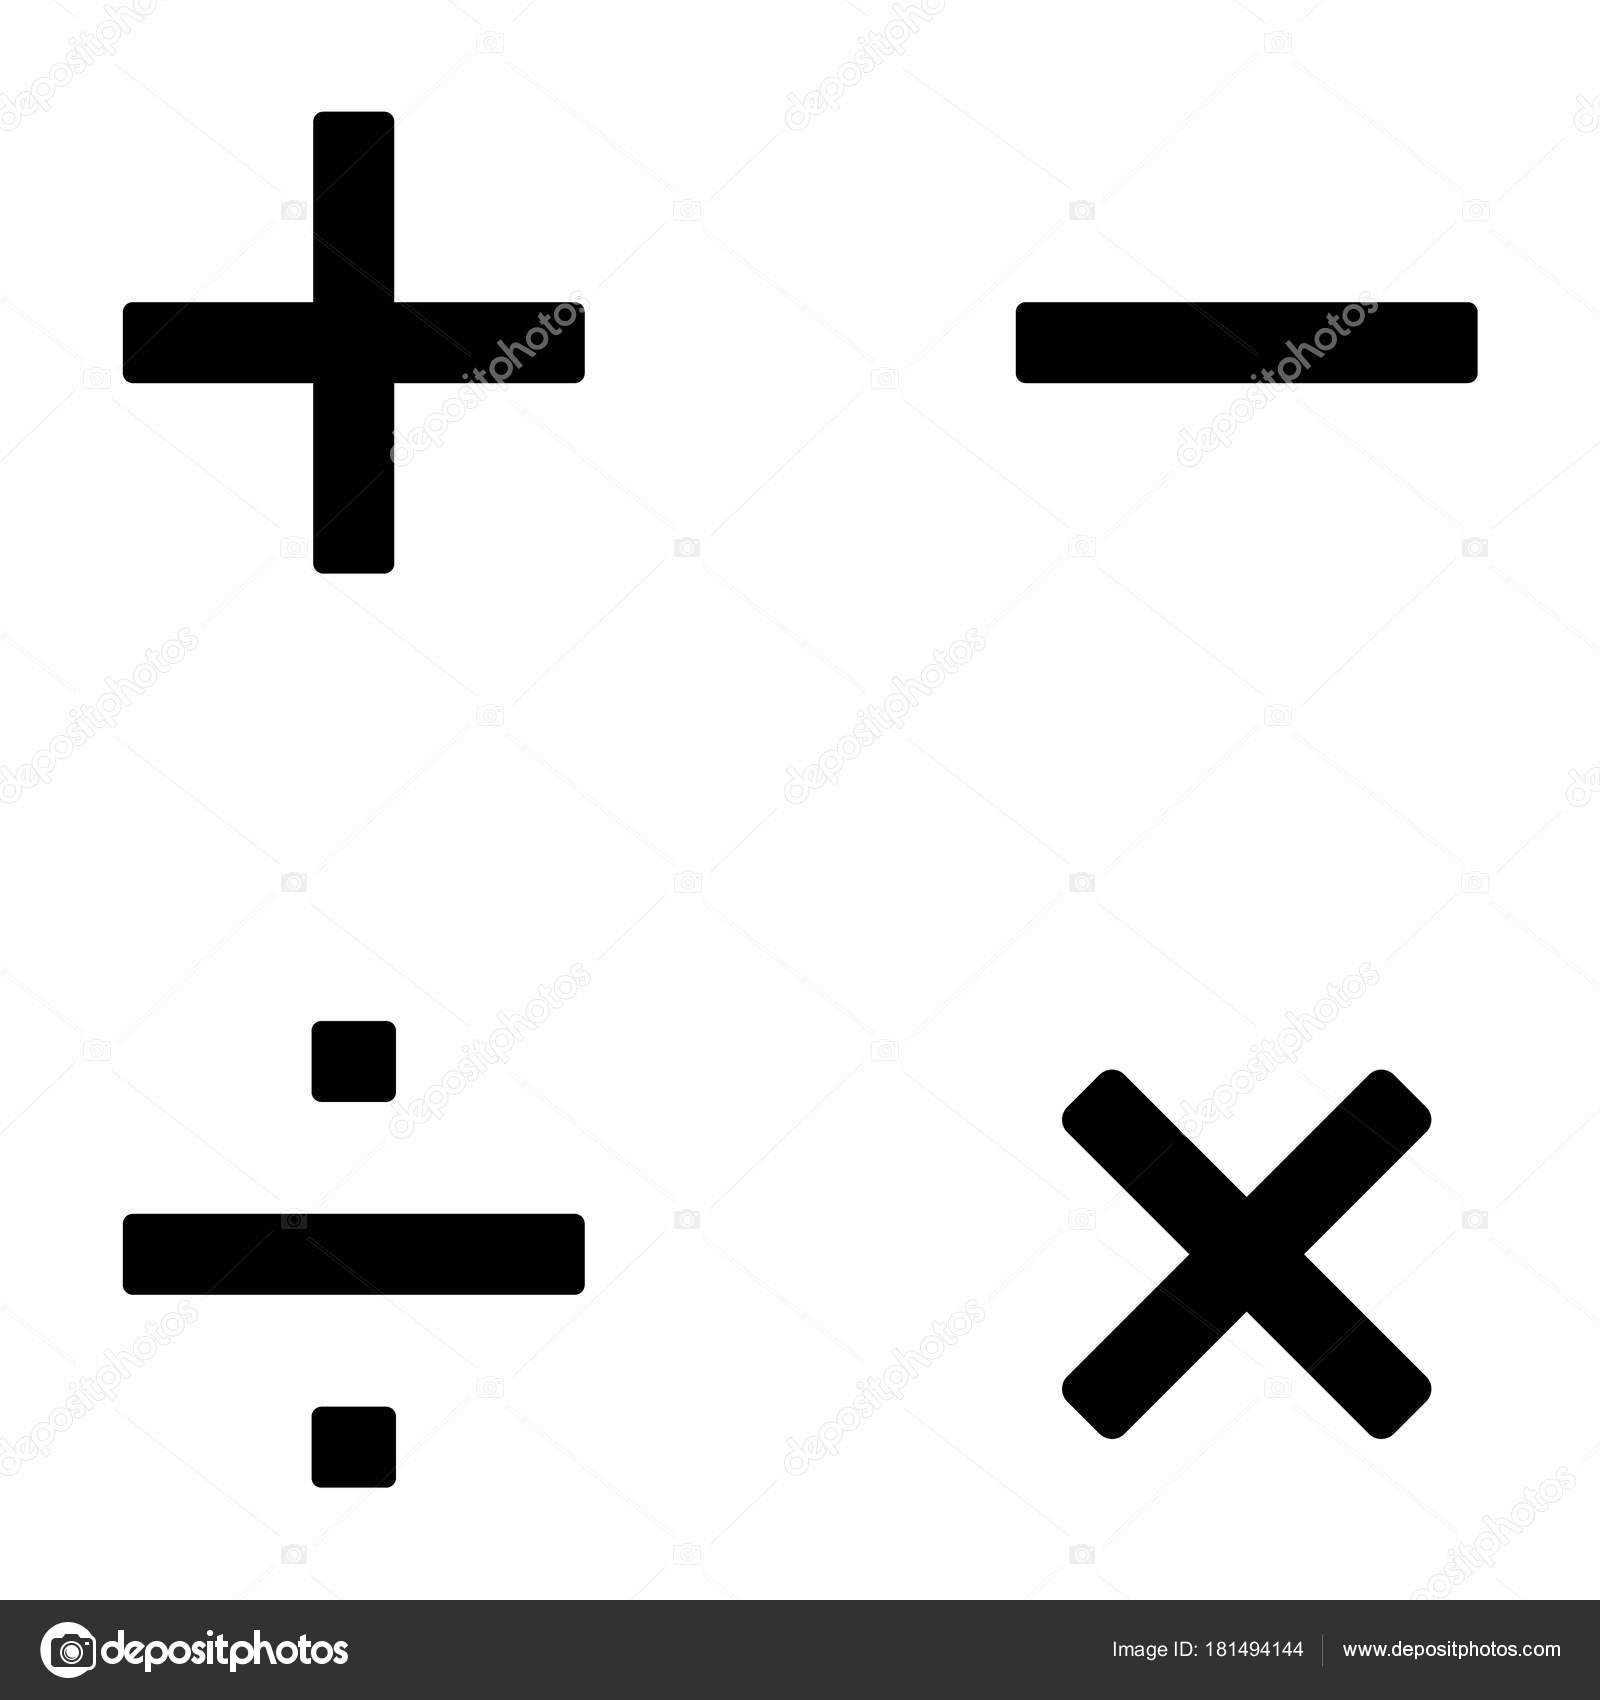 Math symbols raster stock photo viktorijareut 181494144 math symbols raster stock photo biocorpaavc Image collections